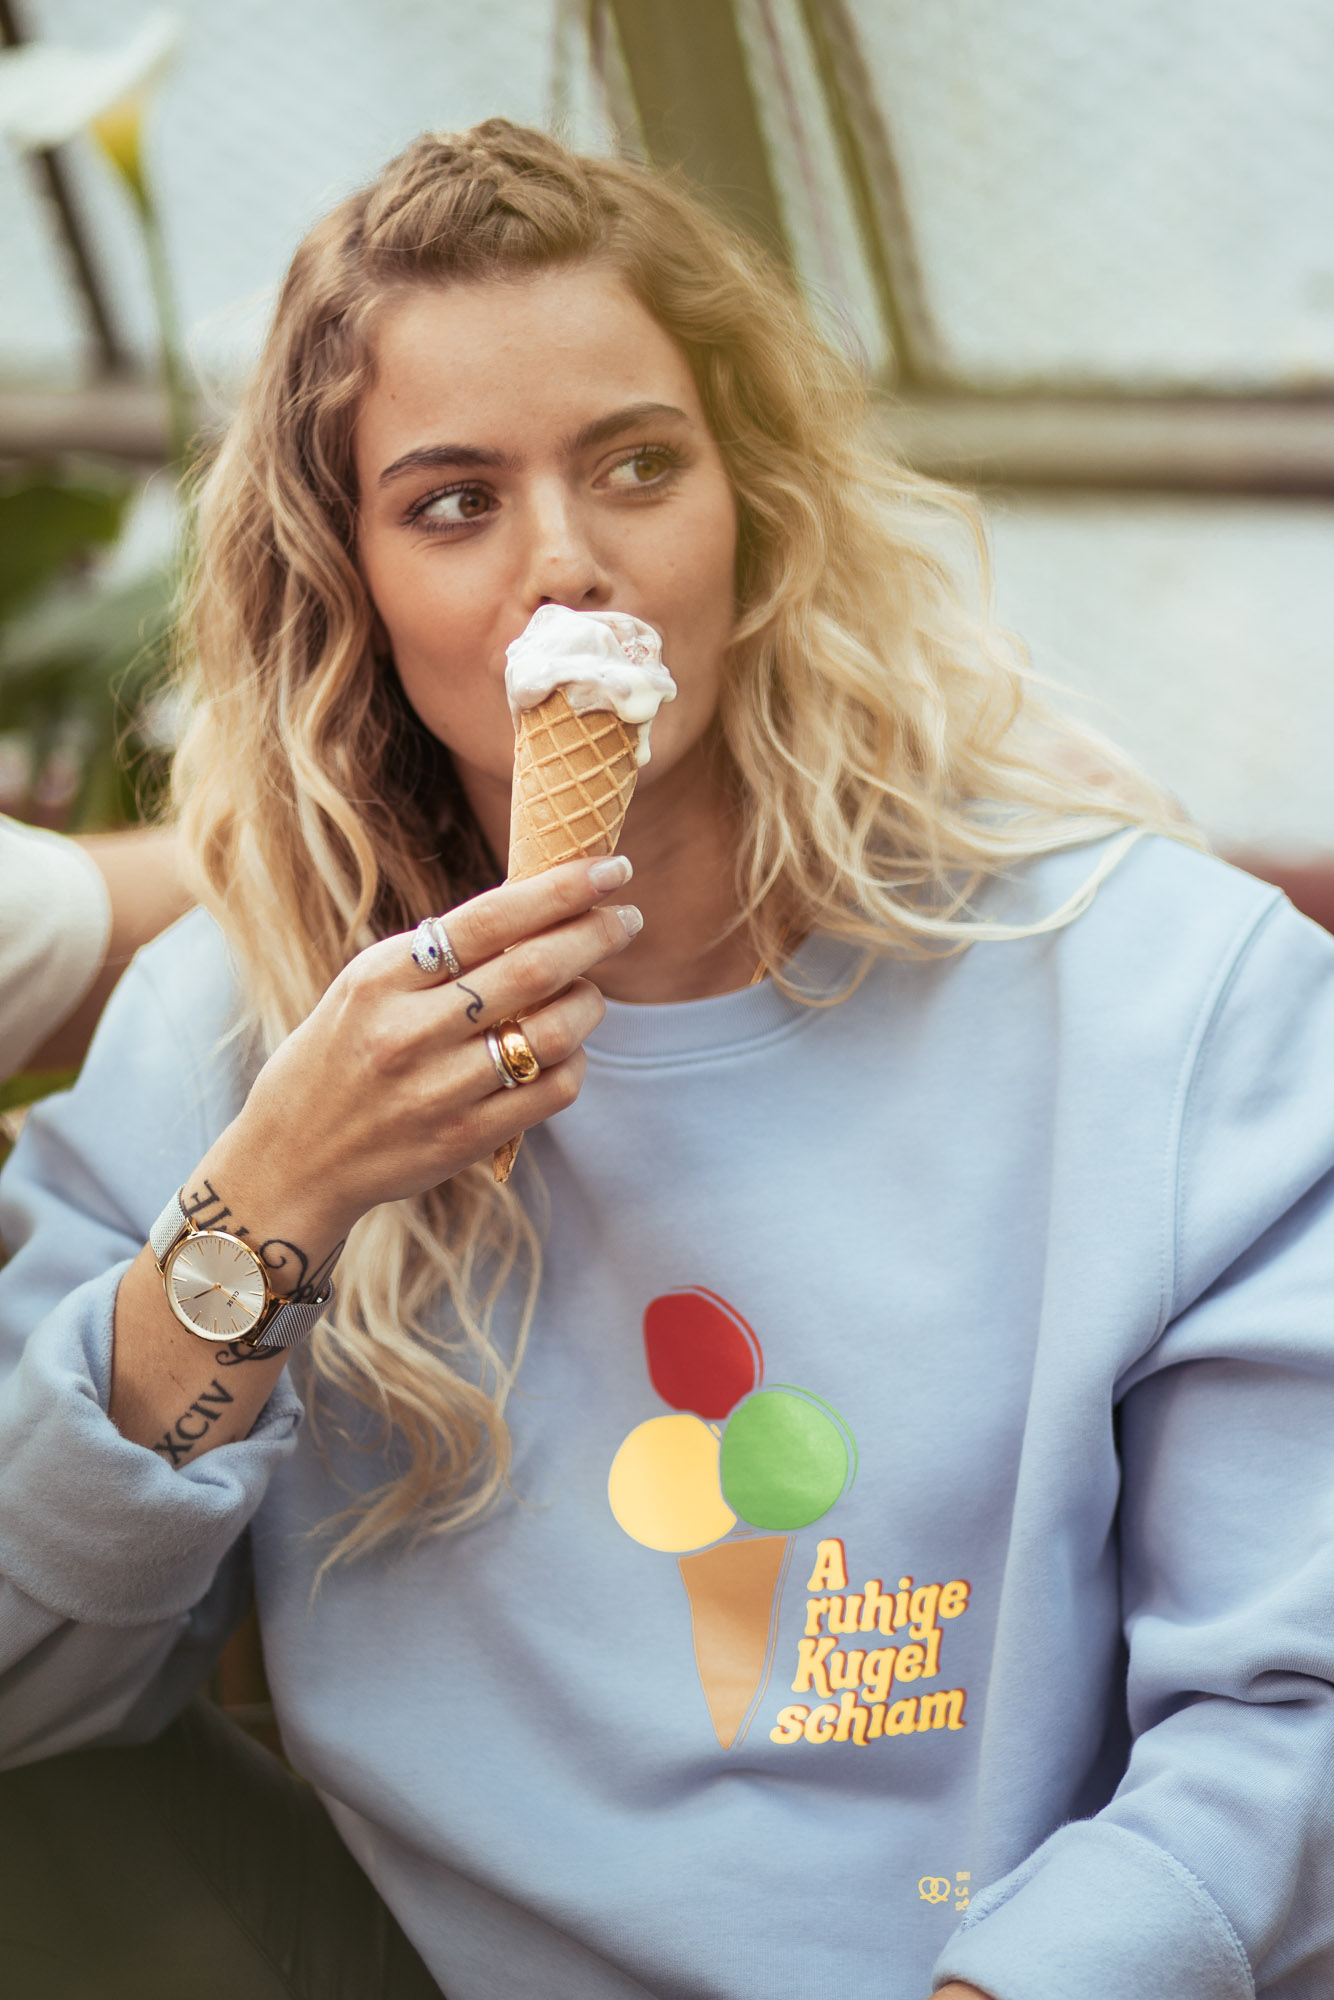 Ruhige Kugel Sweater